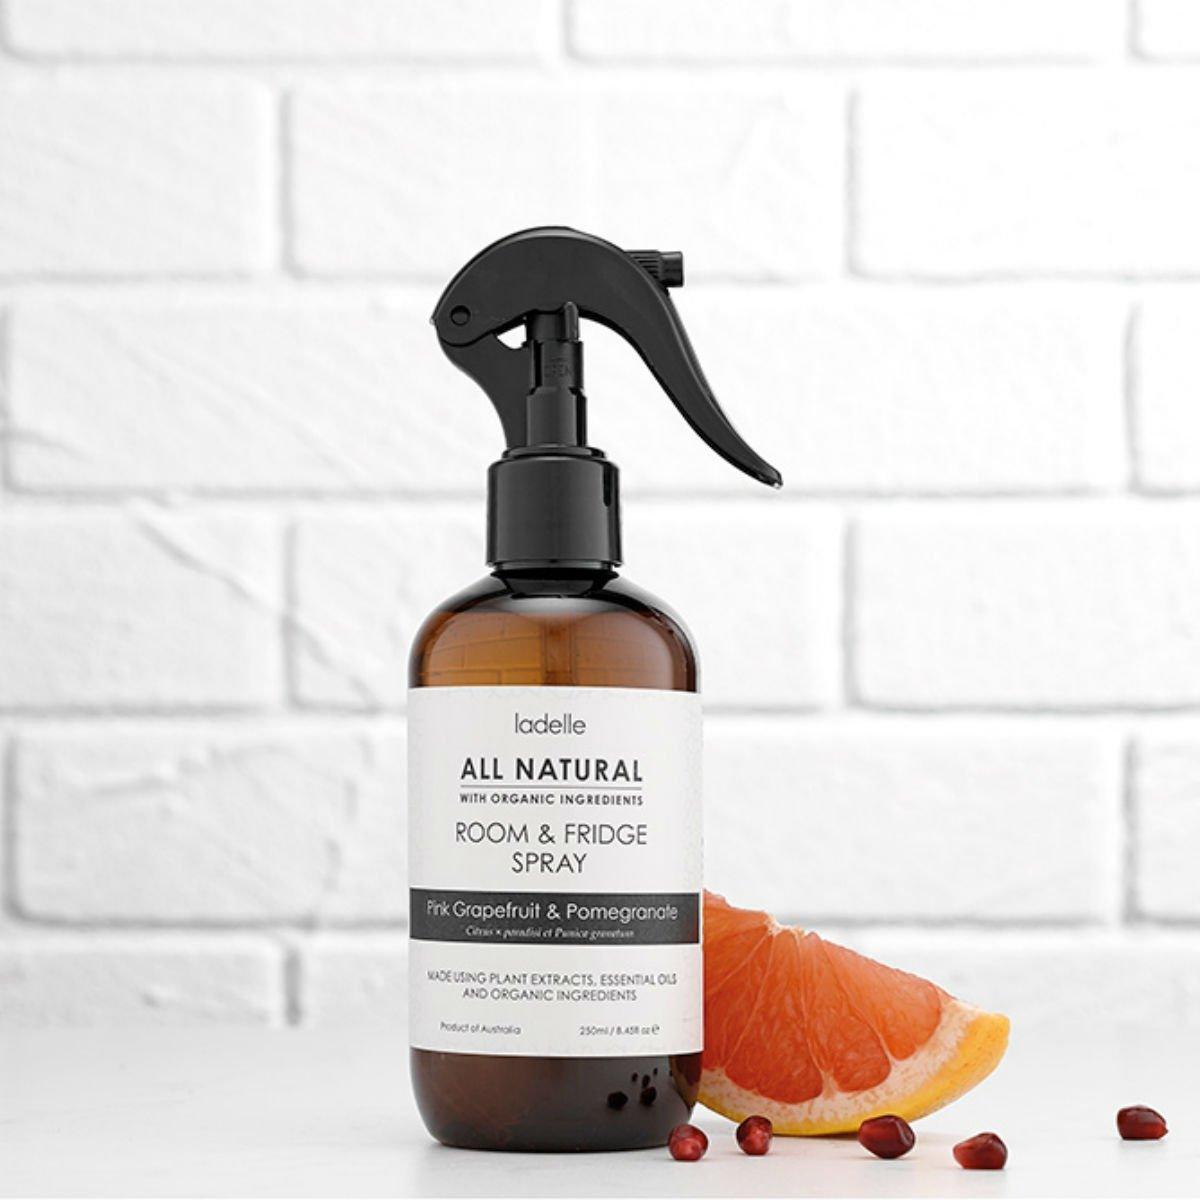 Čistící sprej na lednice a pokoje - Růžový grapefruit a pomeranč - 250 ml